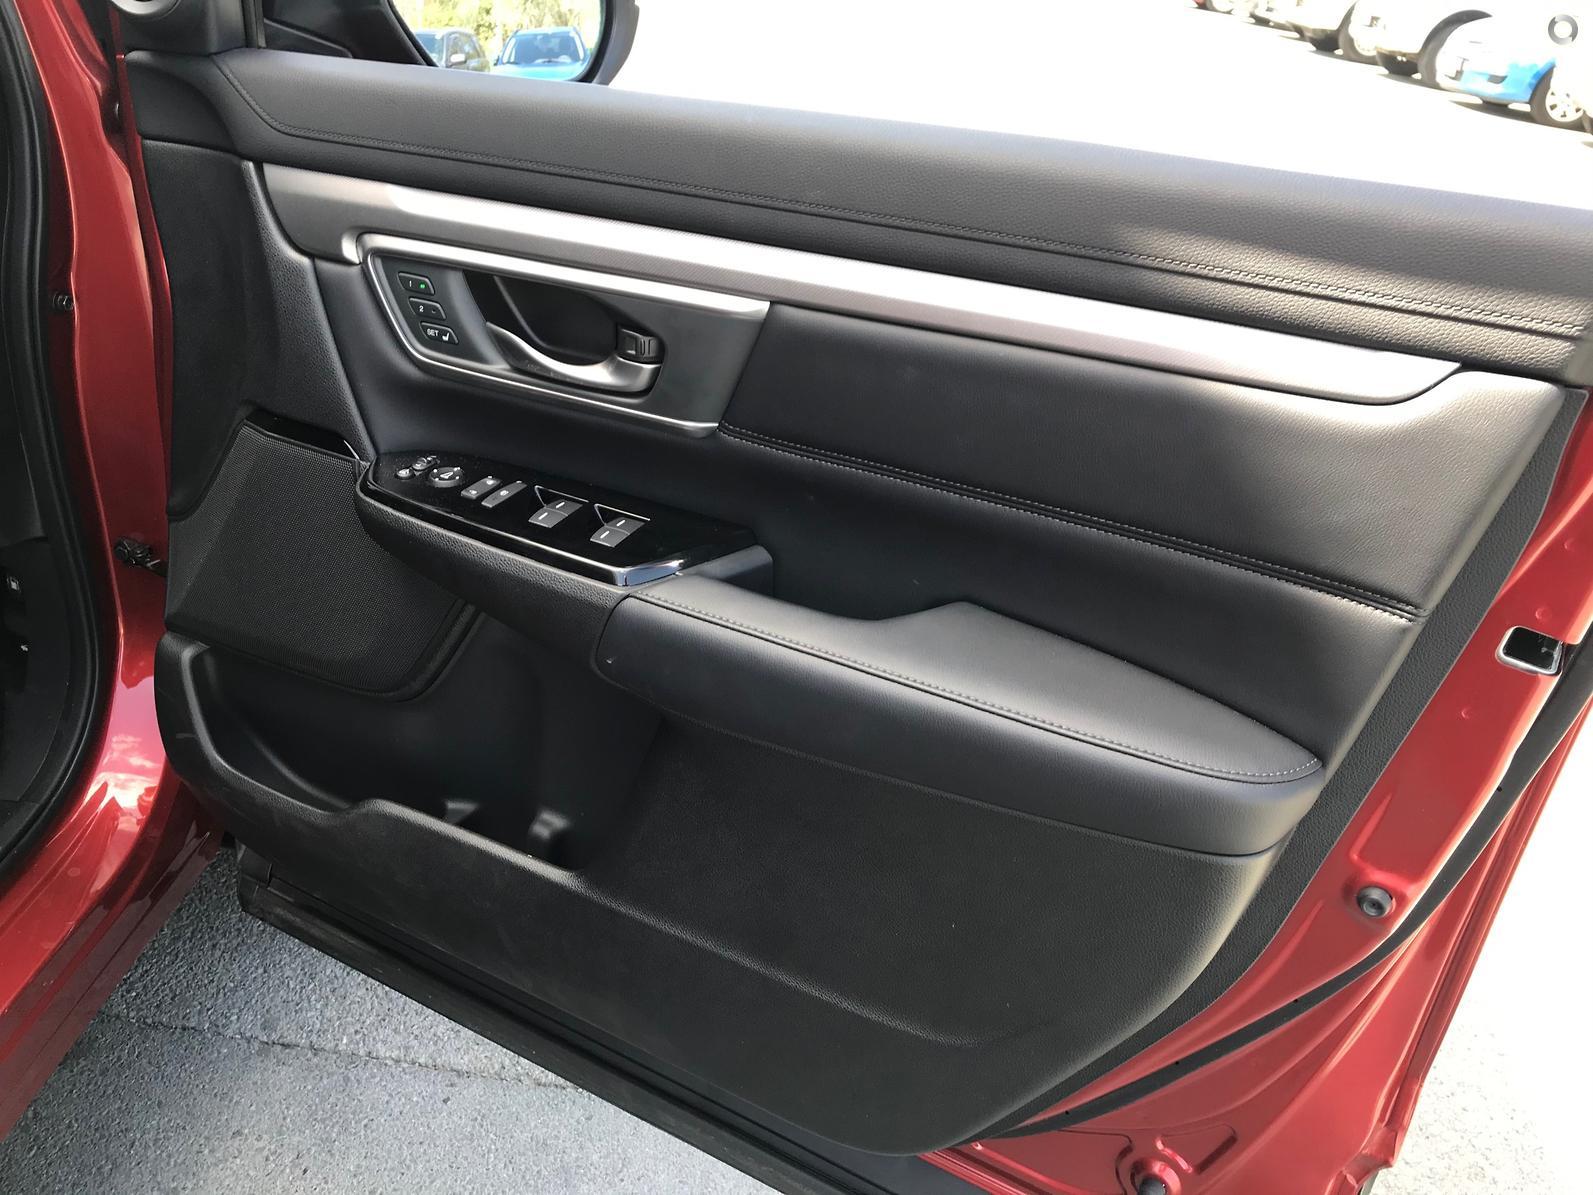 2018 Honda Cr-v VTi-LX RW